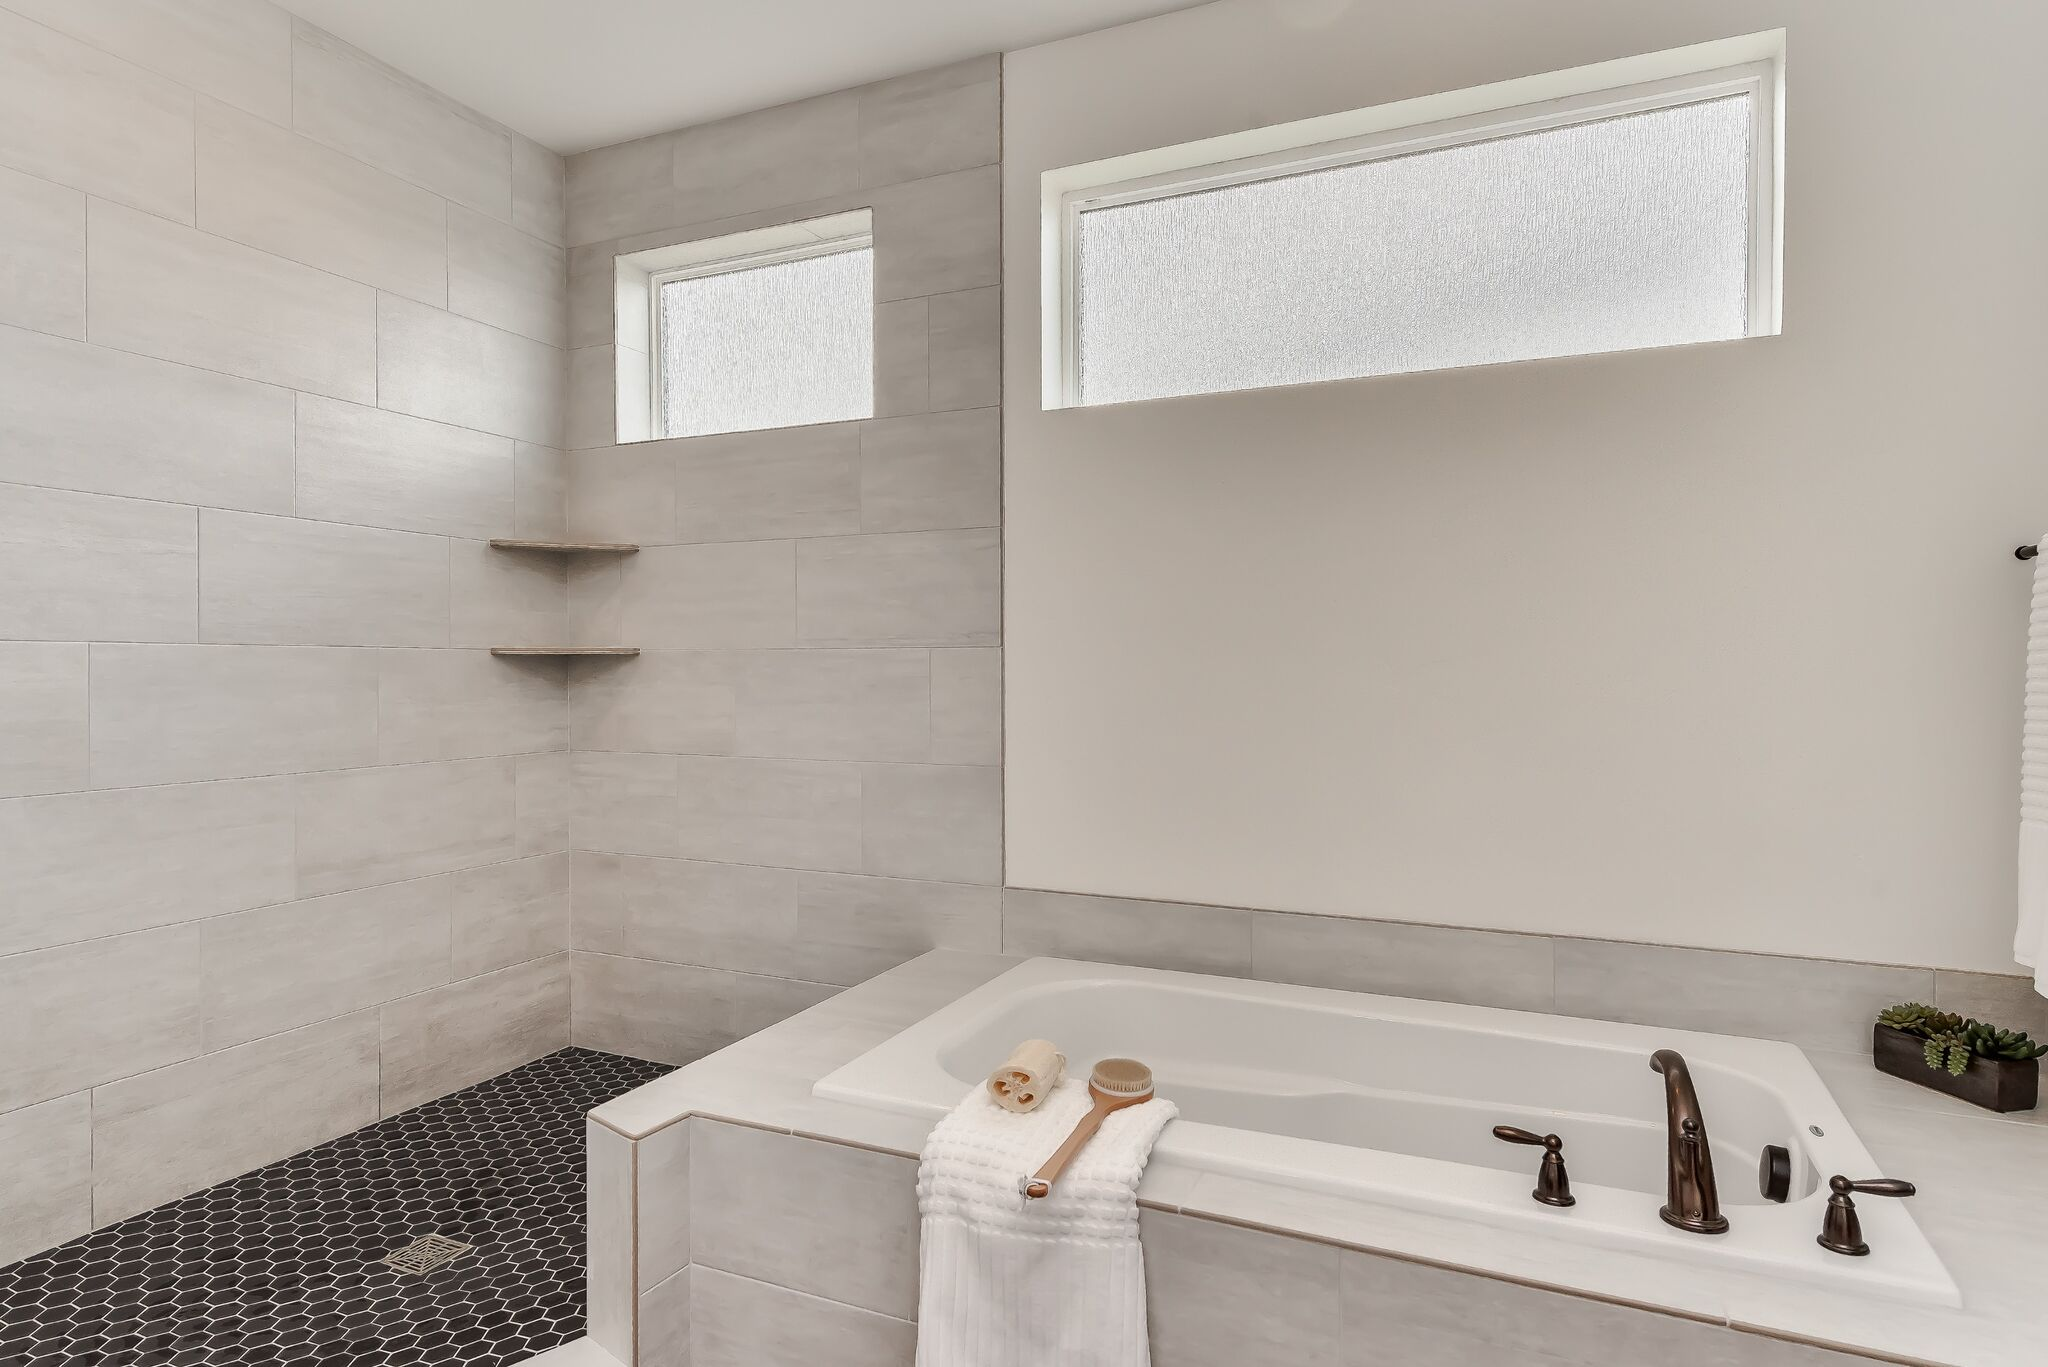 030_Master Bathroom.jpg